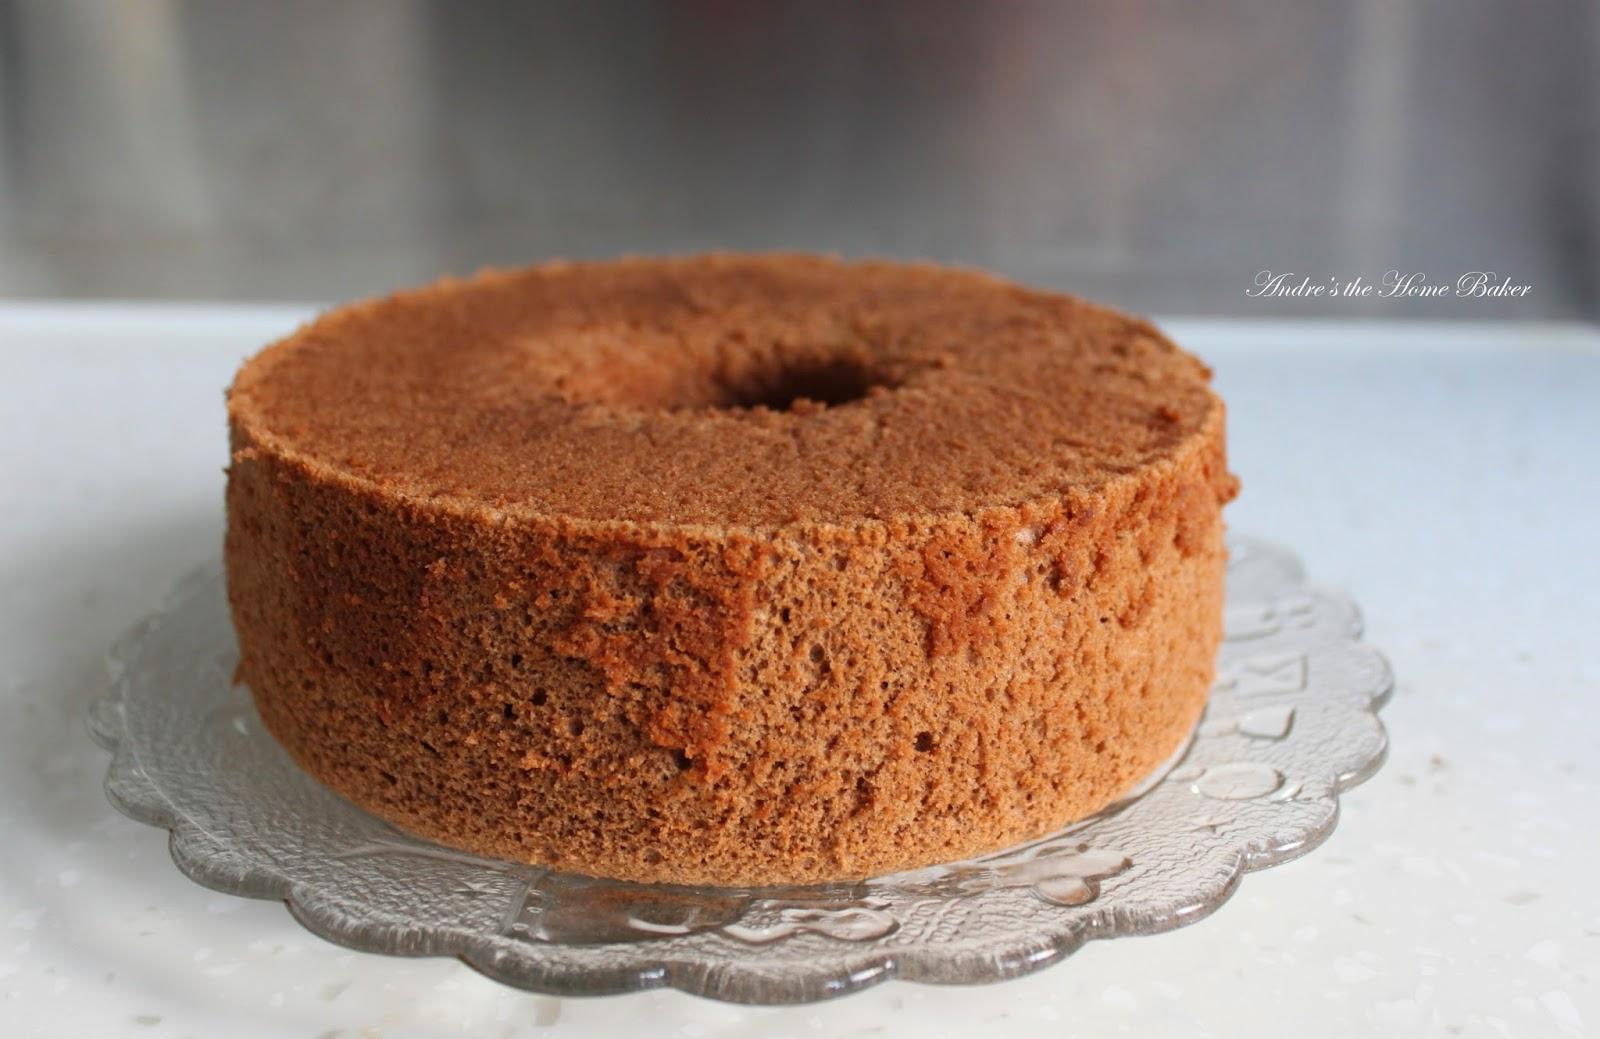 Andre's the Home Baker: ♥ Chocolate Mocha Chiffon Cake ♥